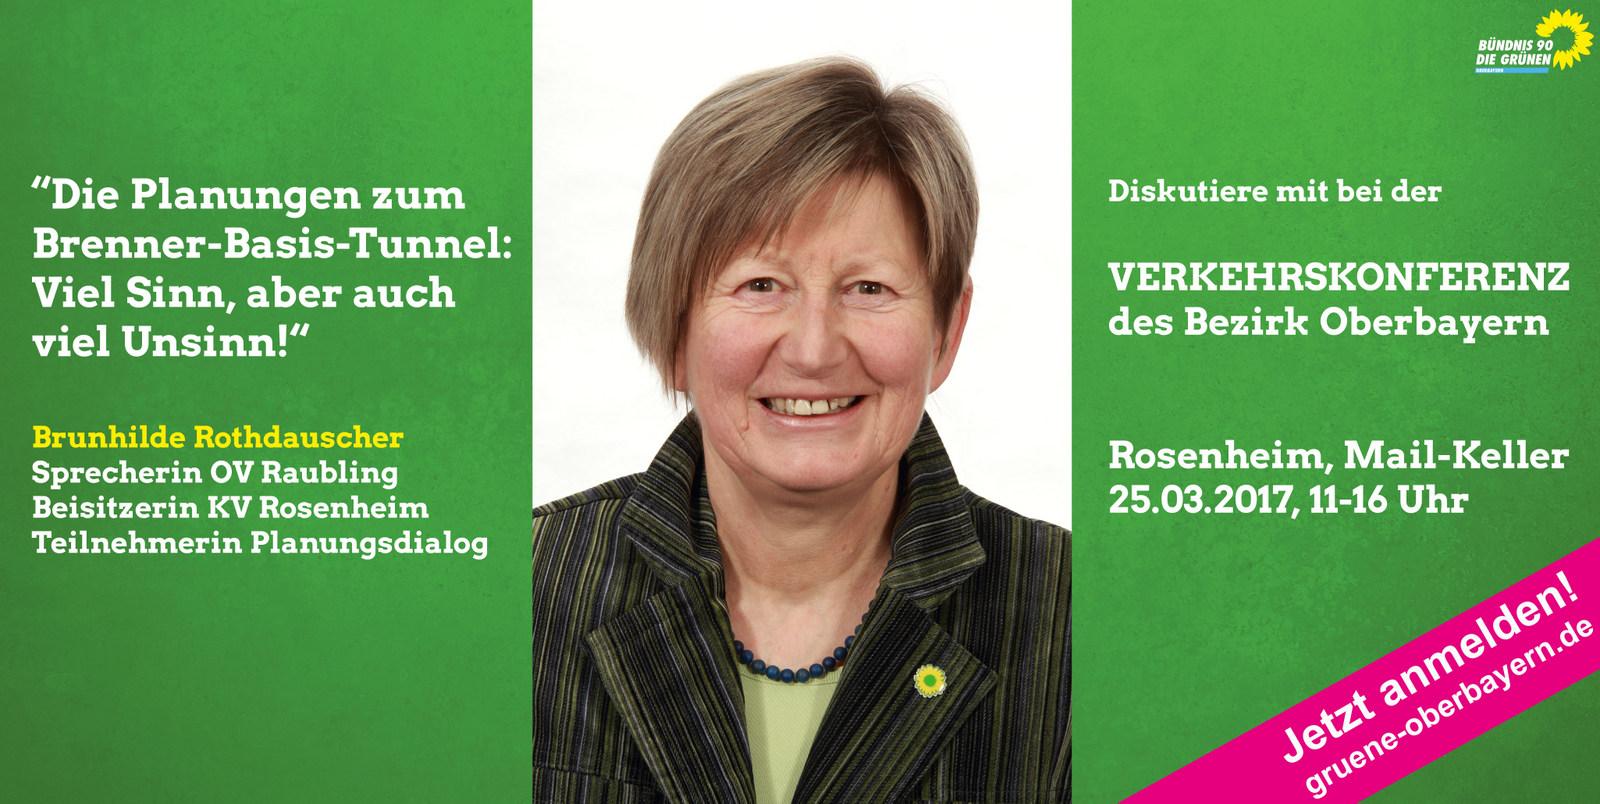 http://gruene-oberbayern.de/wp-content/uploads/2017/03/SharepicVerkehr_Brunhilde.jpg